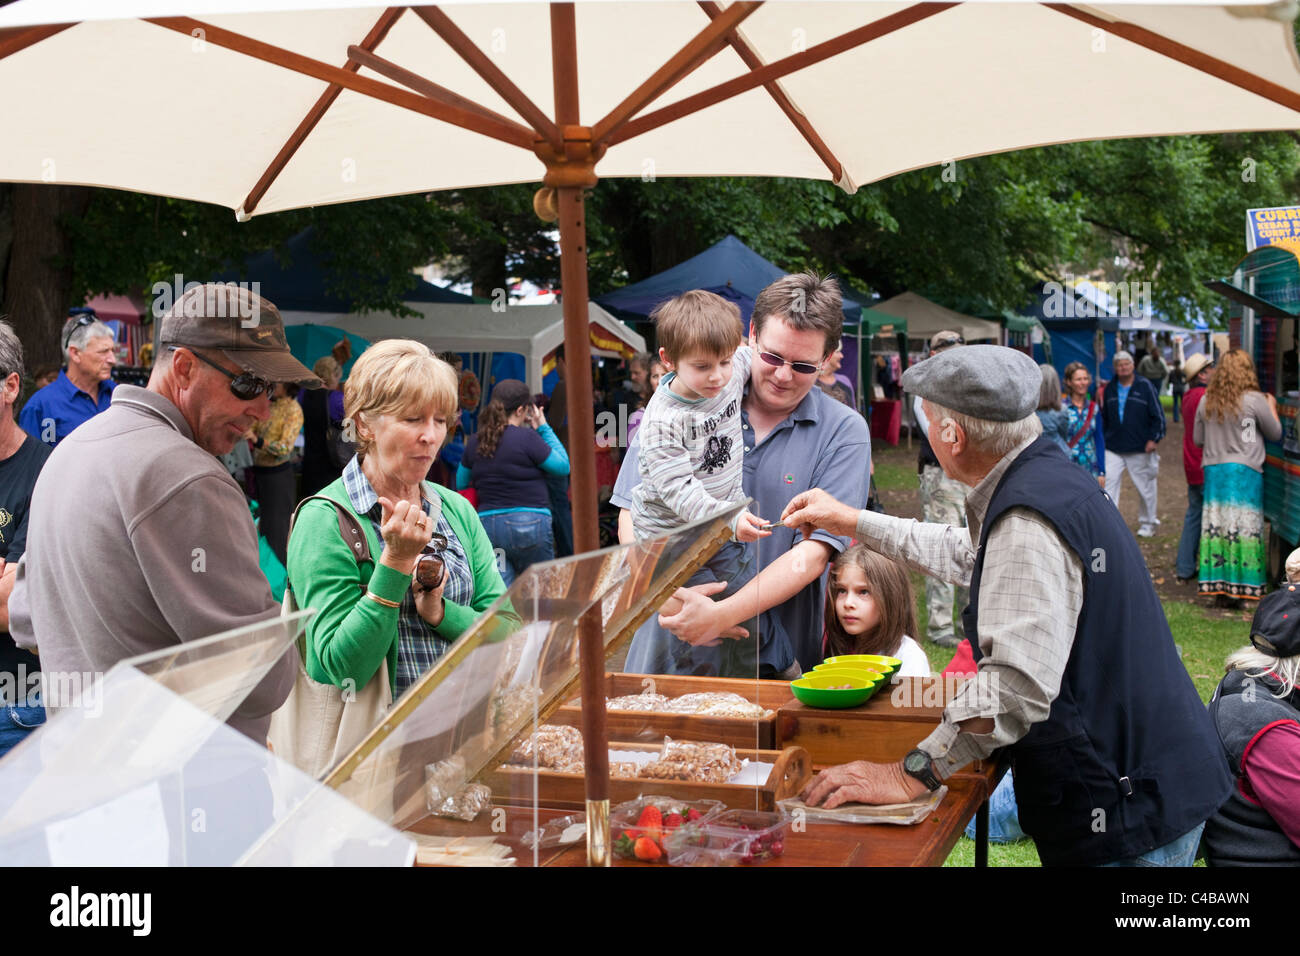 Food stall at Denmark markets. Denmark, Western Australia, Australia - Stock Image